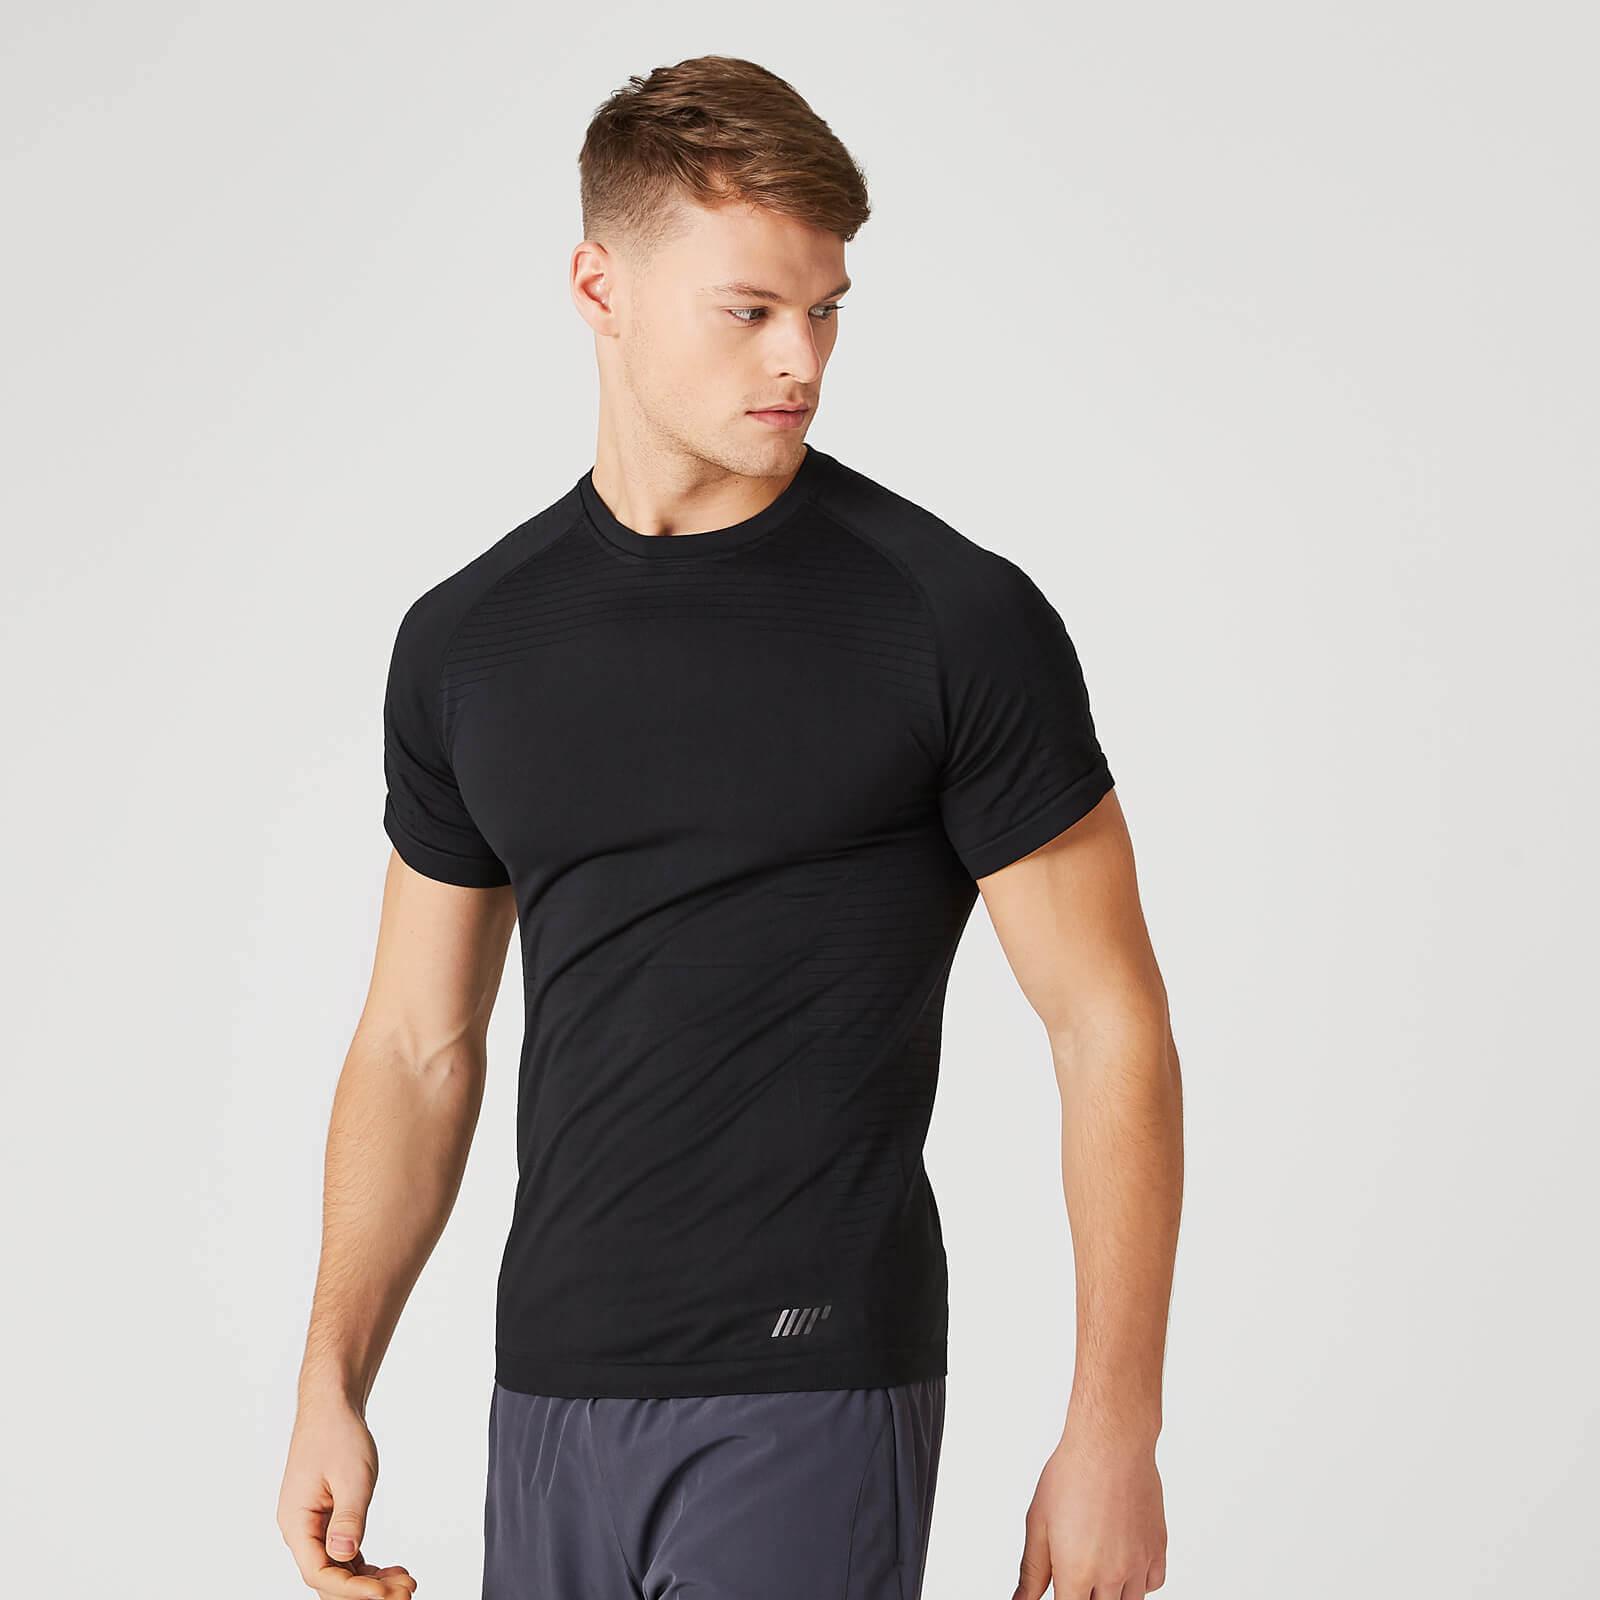 Myprotein Elite Seamless T-Shirt – Black - S